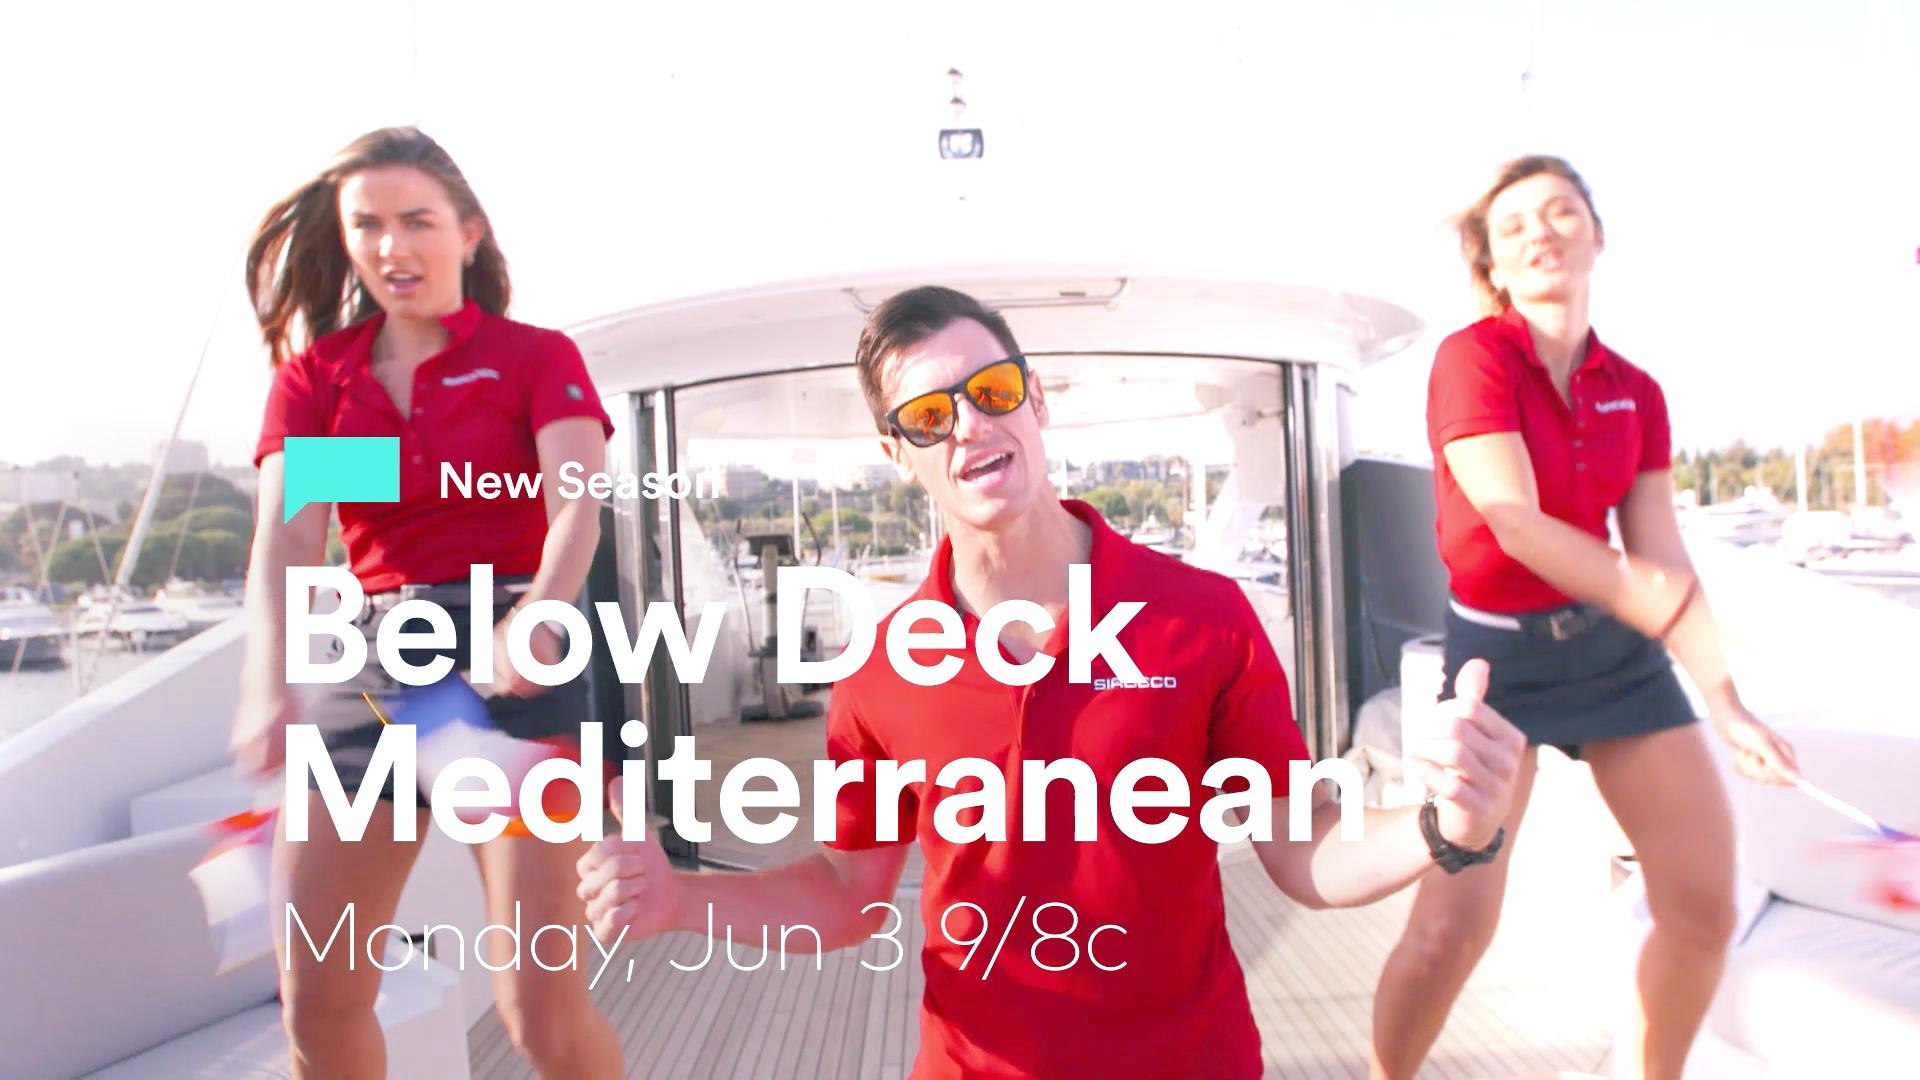 Below Deck Mediterranean Season 4: The Official Rap